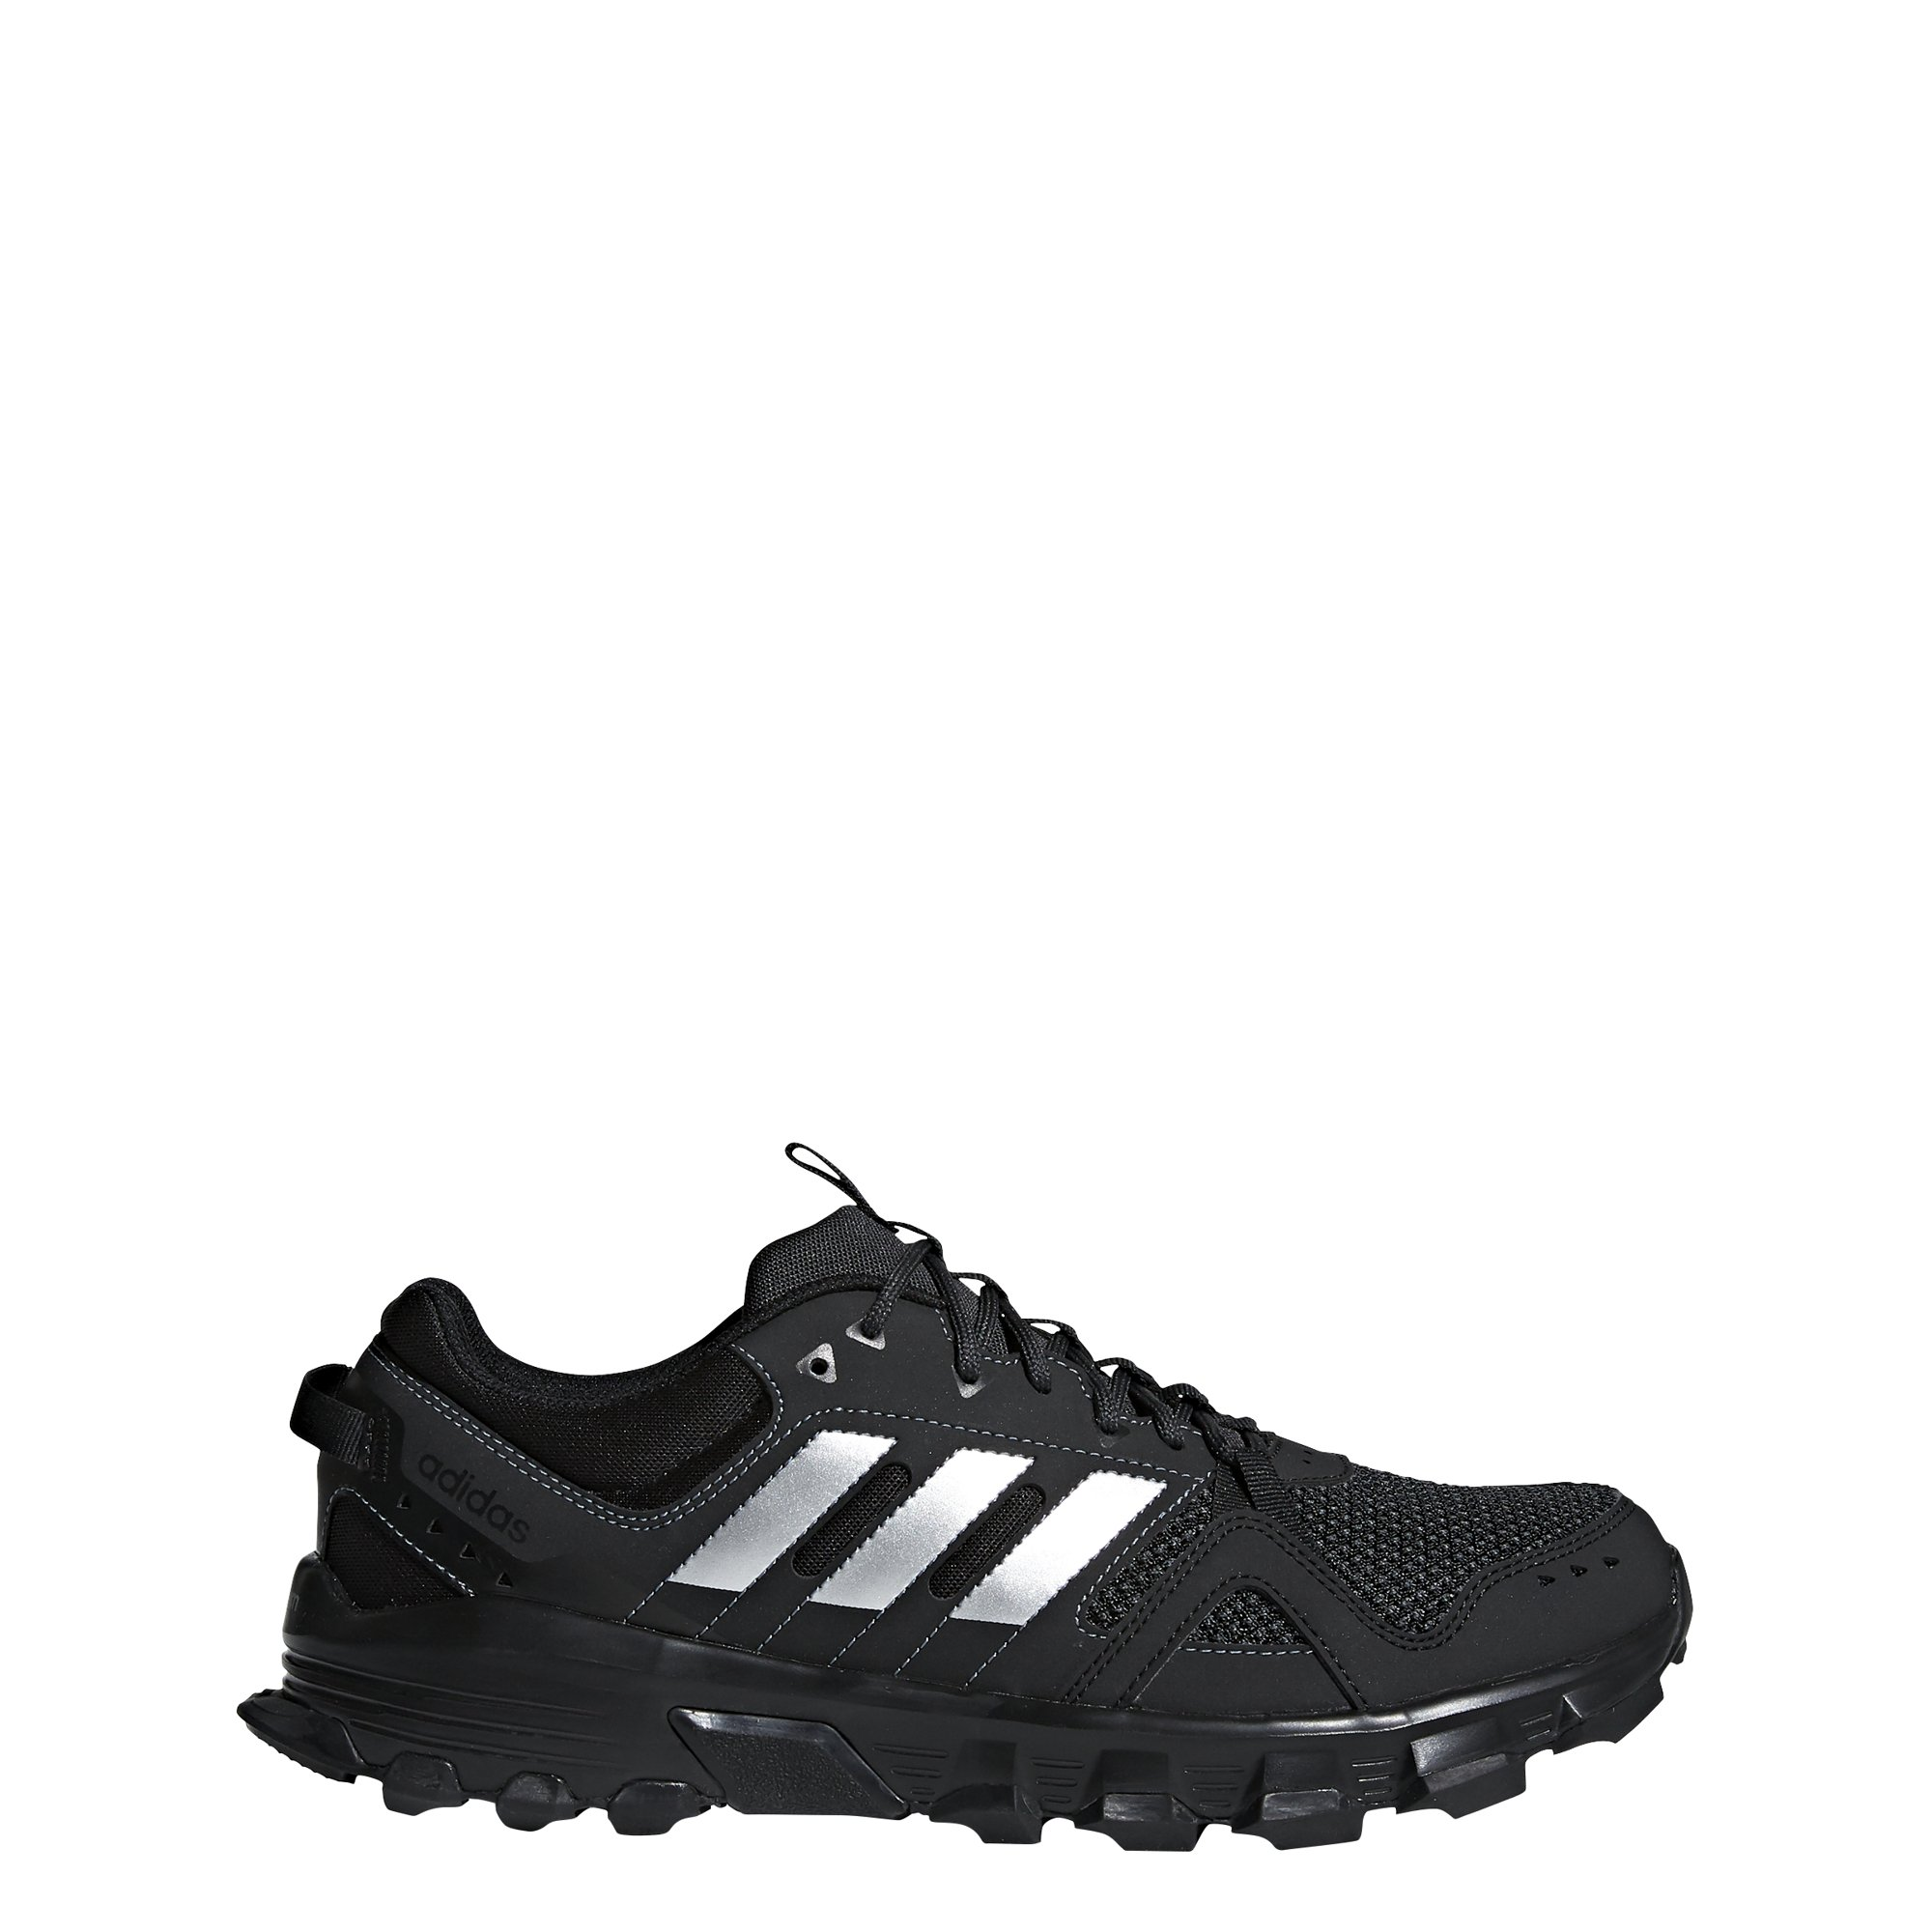 adidas Men's Rockadia m Trail Running Shoe, Core Black/Matte Silver/Carbon, 13 M US by adidas